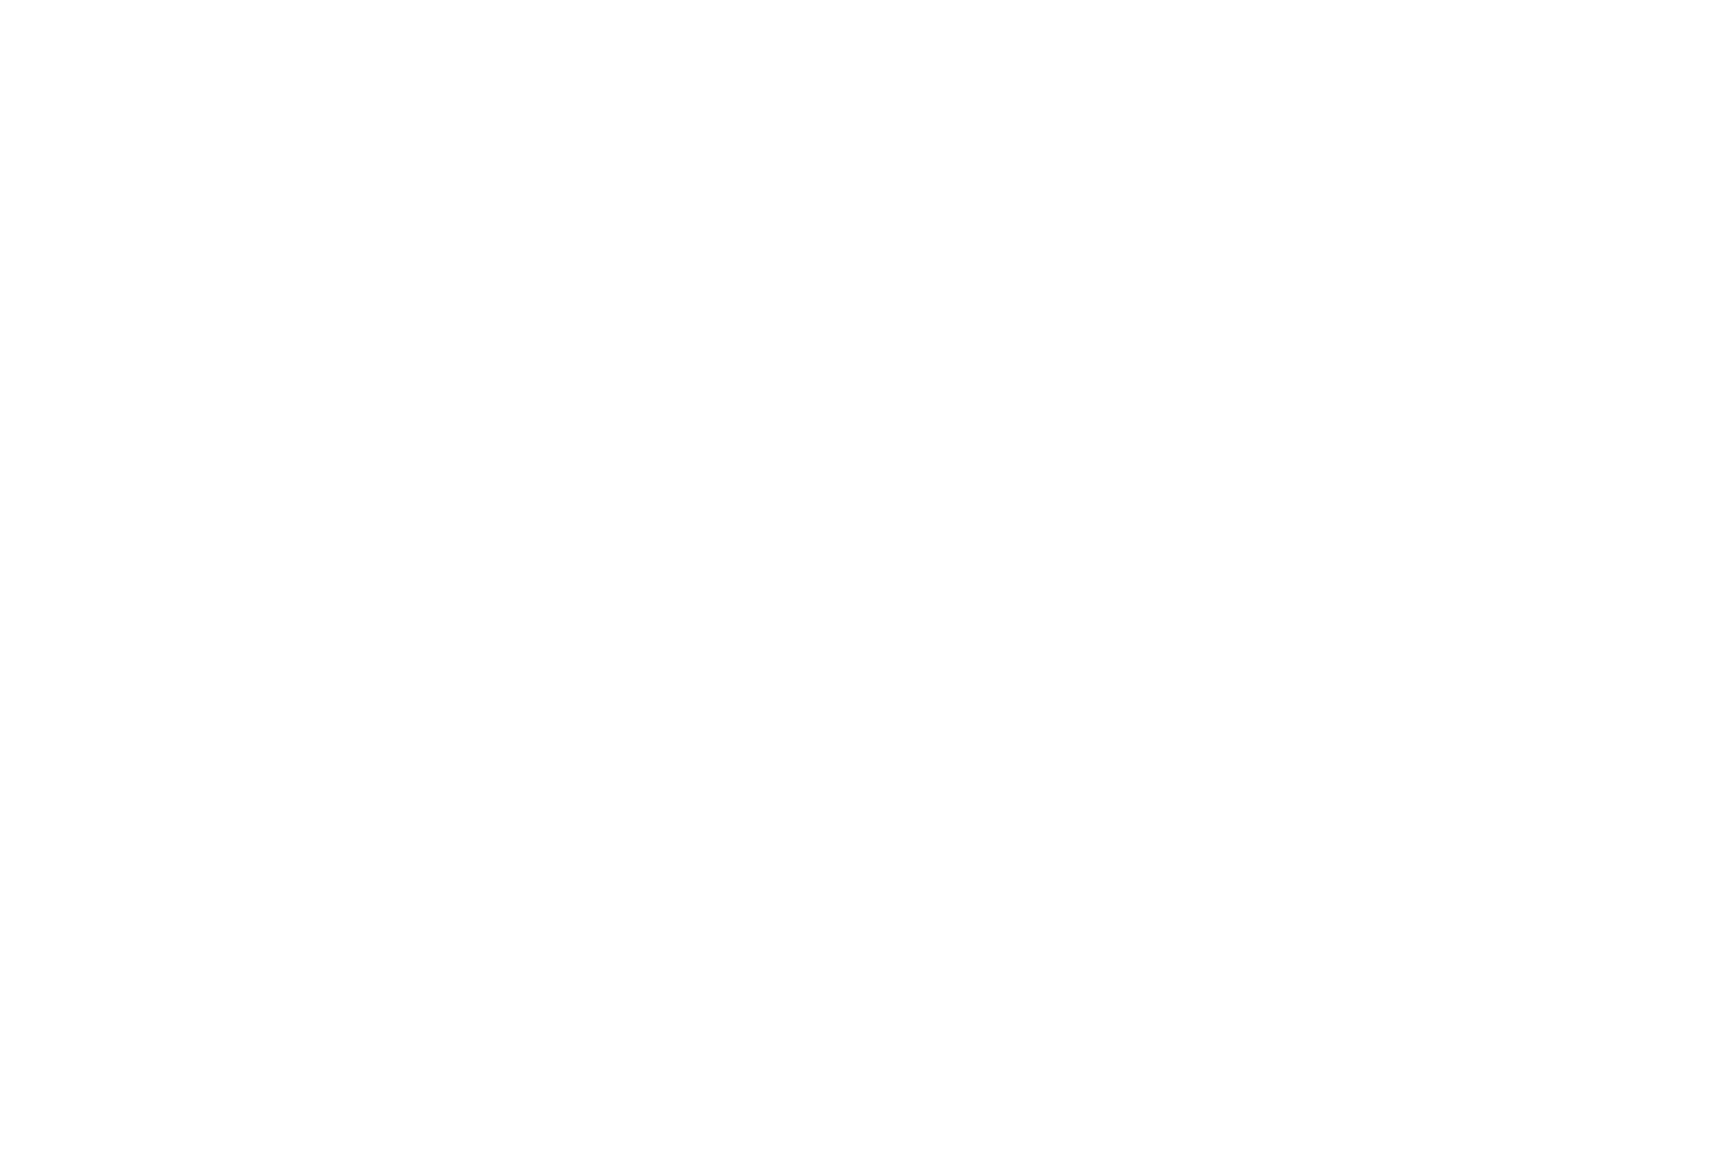 OFFICIAL-SELECTION-New-Media-Film-Festival-2020